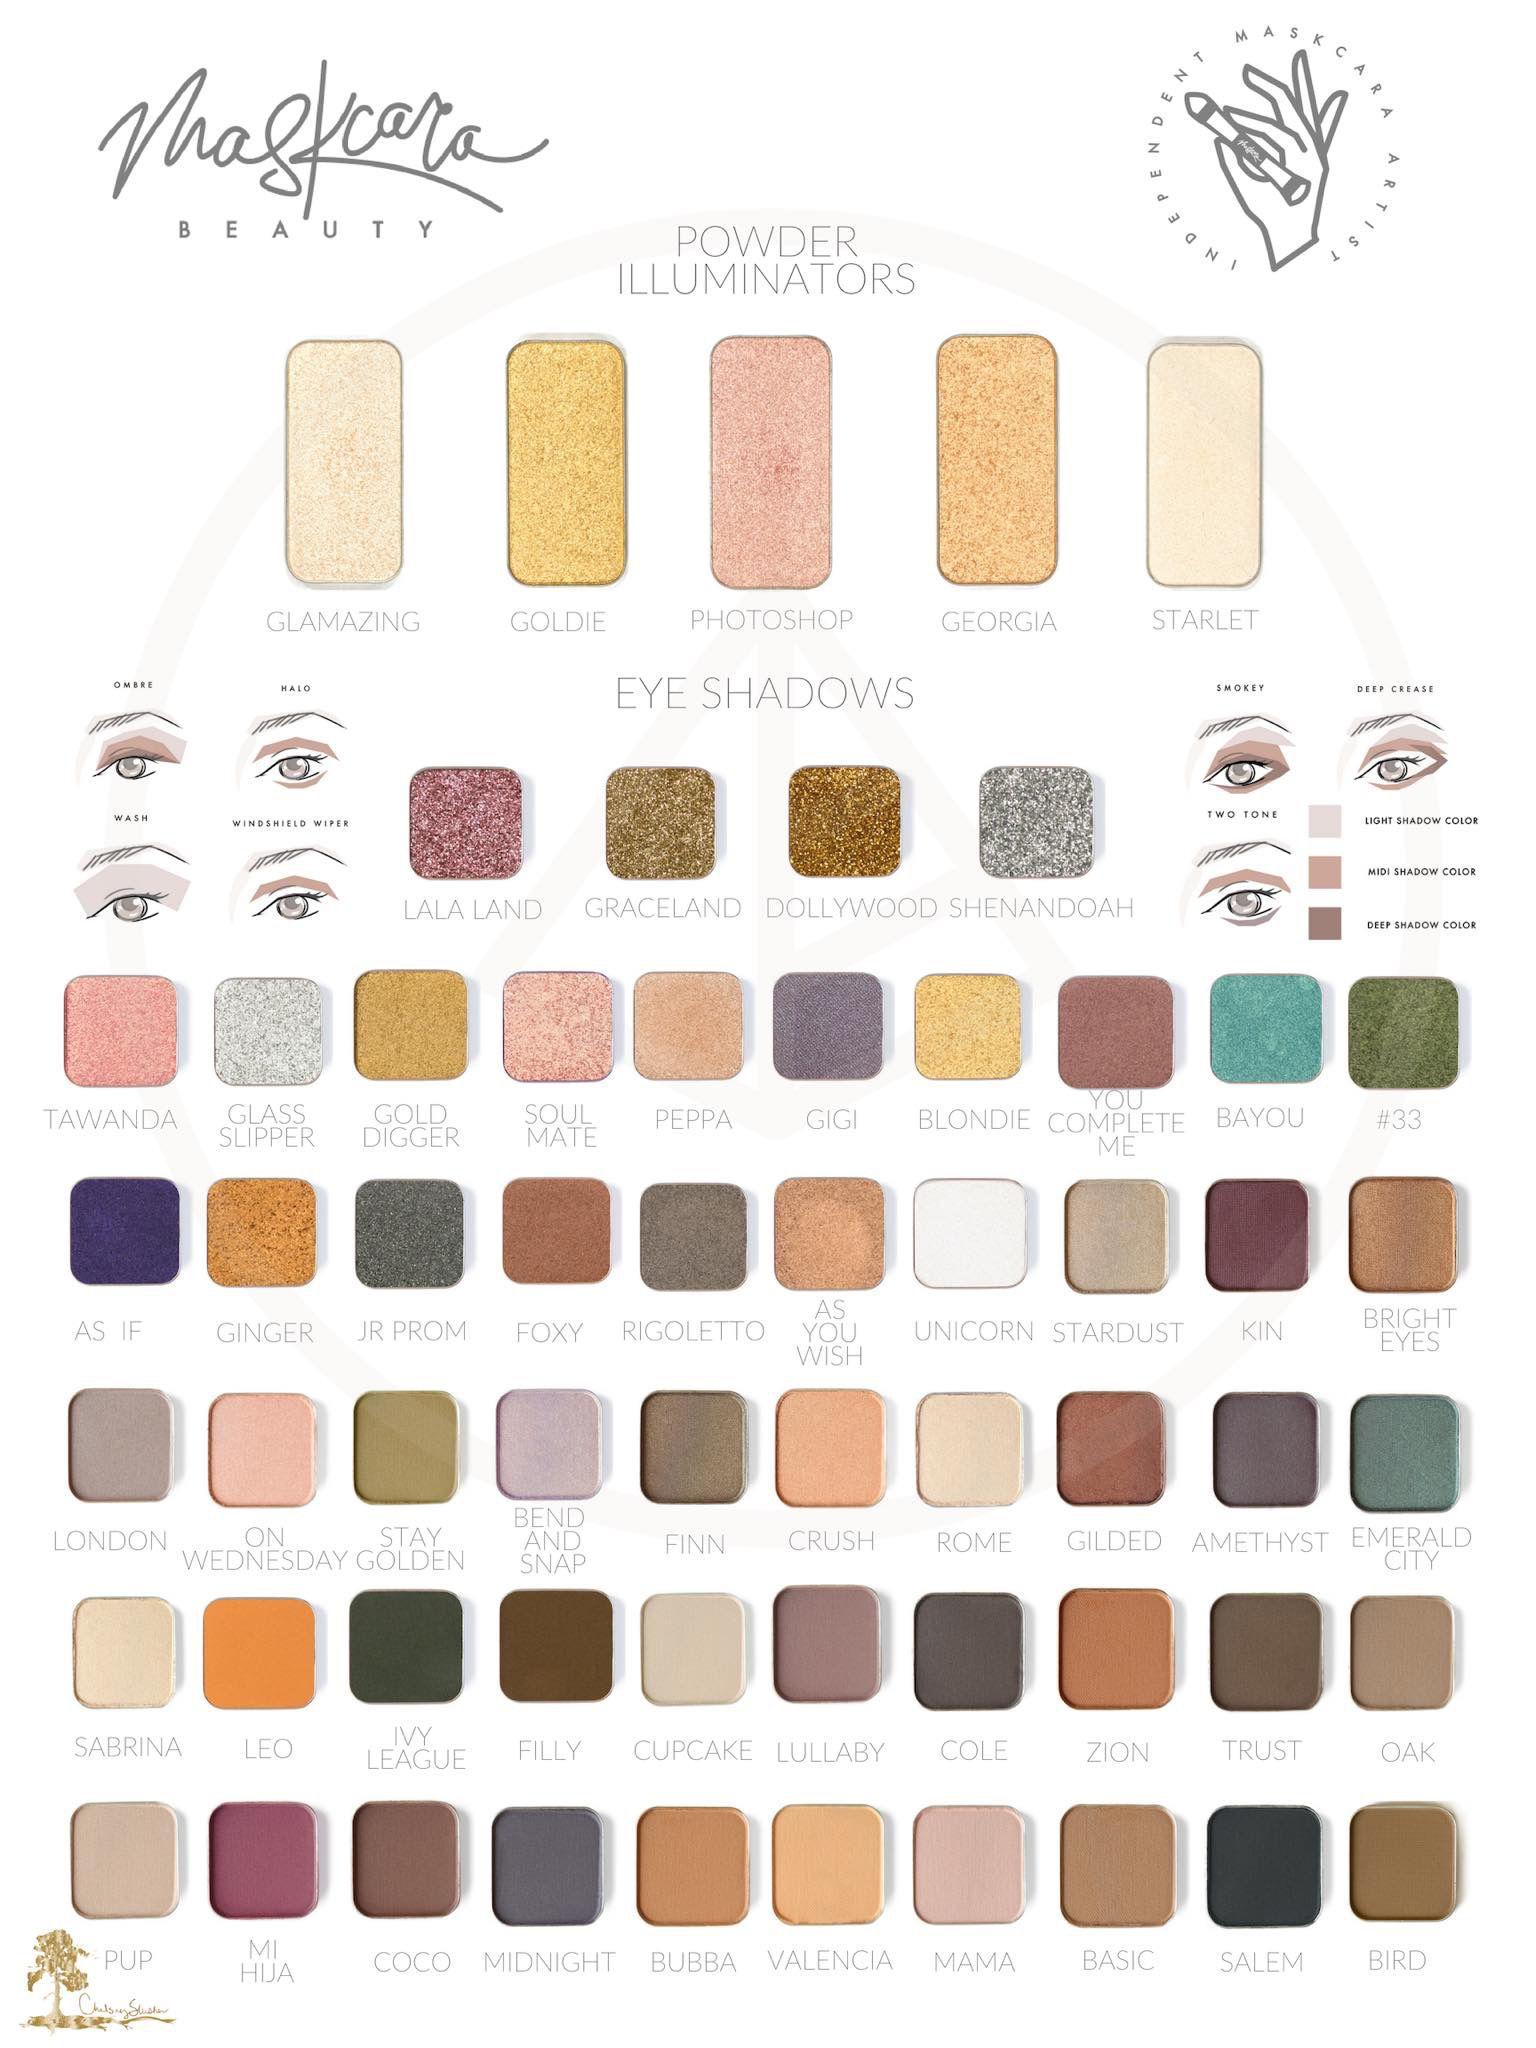 Illuminators and eyeshadow swatches Maskcara beauty